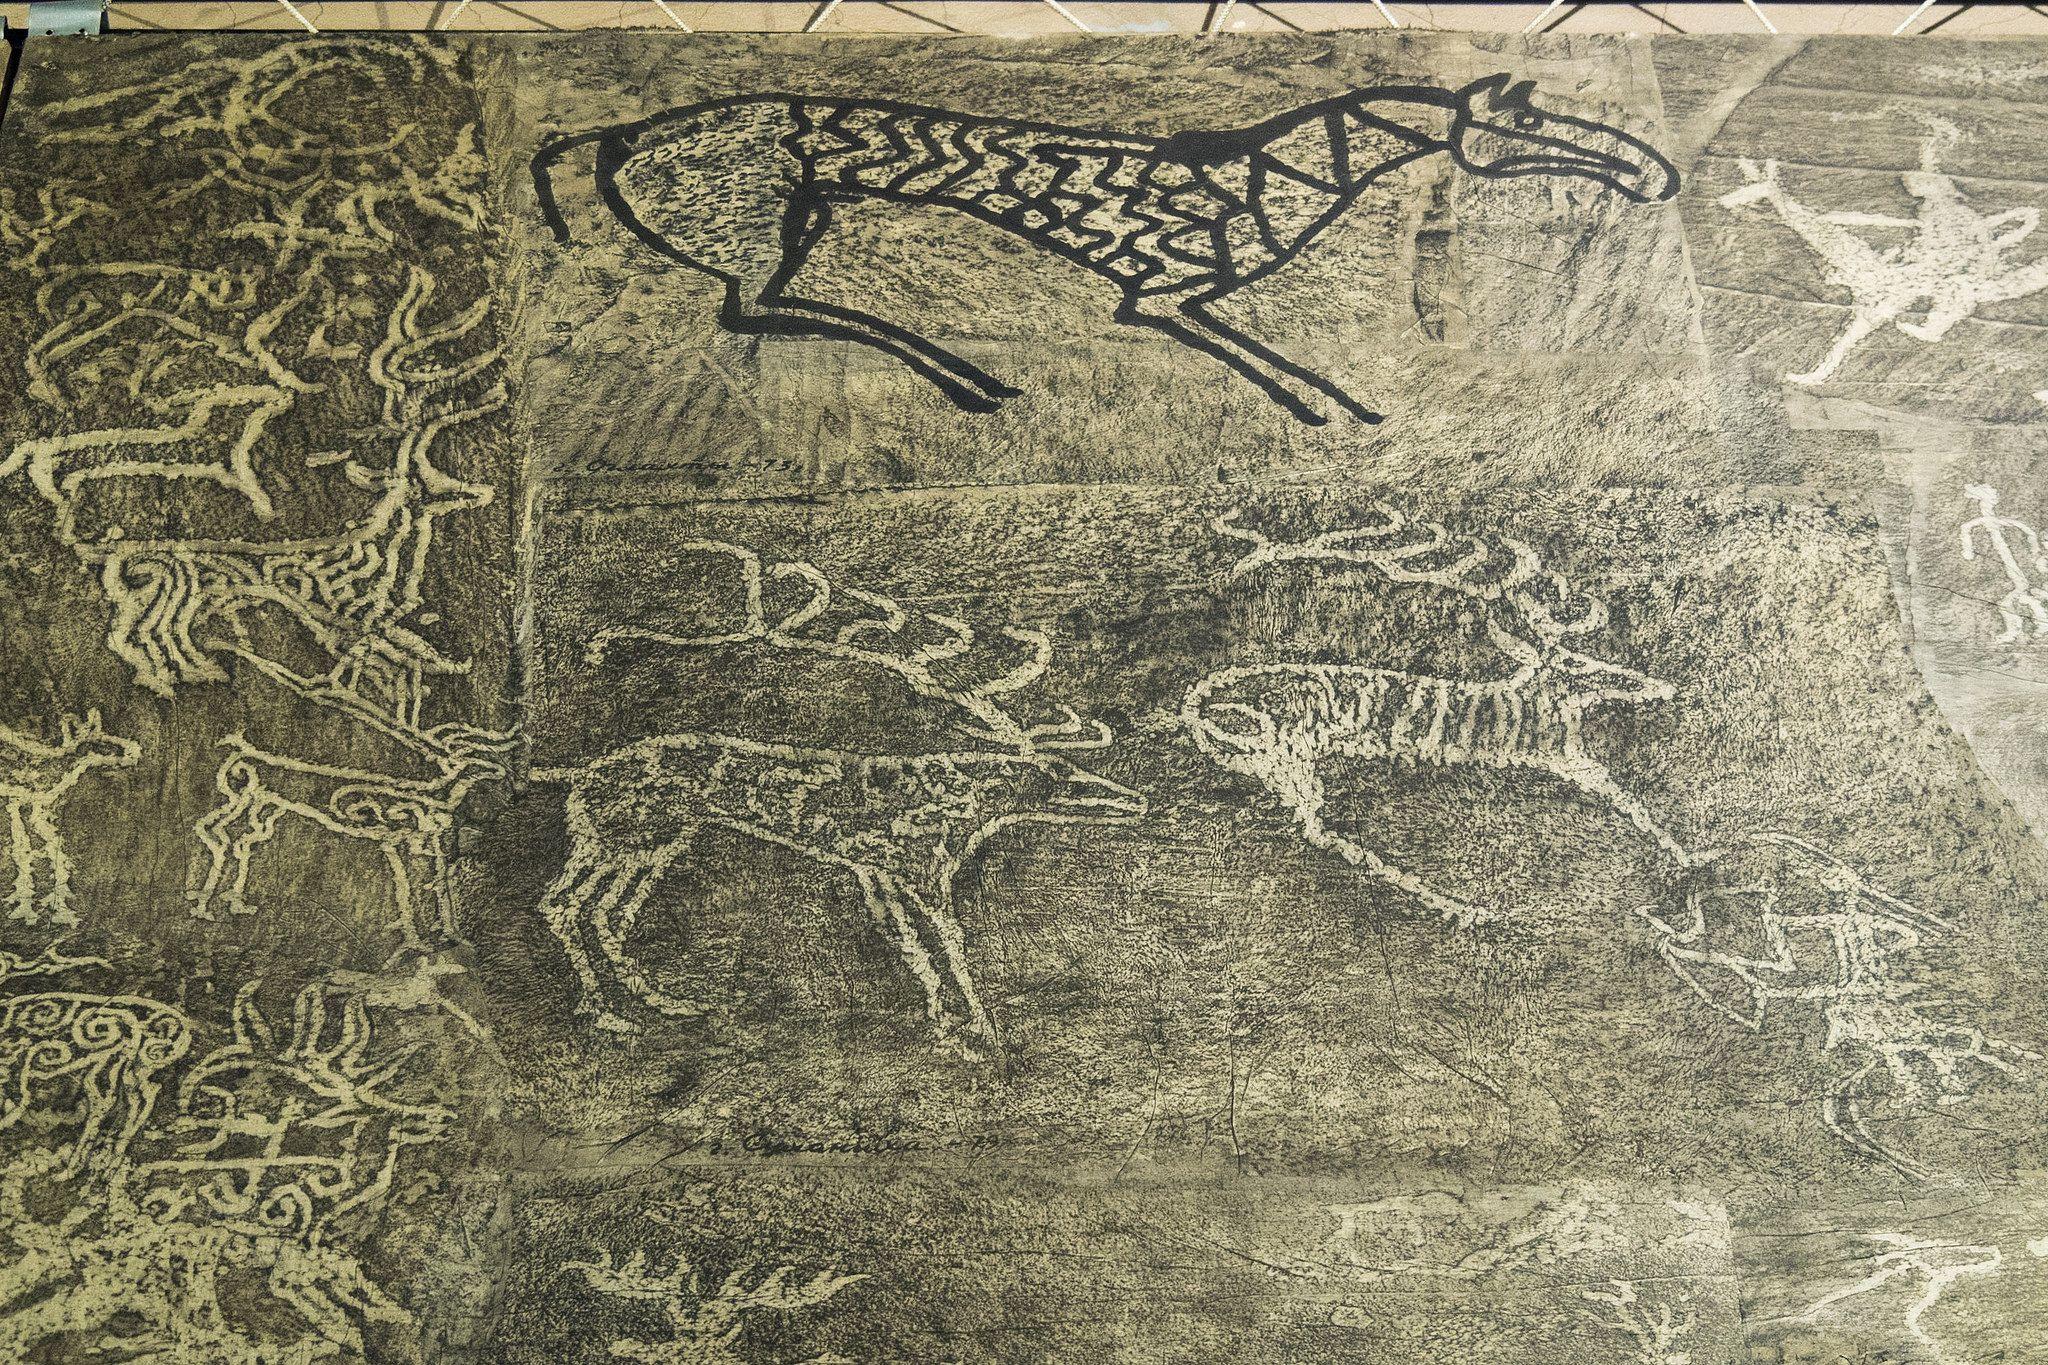 Altay Daglari Sitesi Kalbak Tash Ile Ilgili Gorsel Sonucu Petroglyphs Ancient Animals Ancient Art